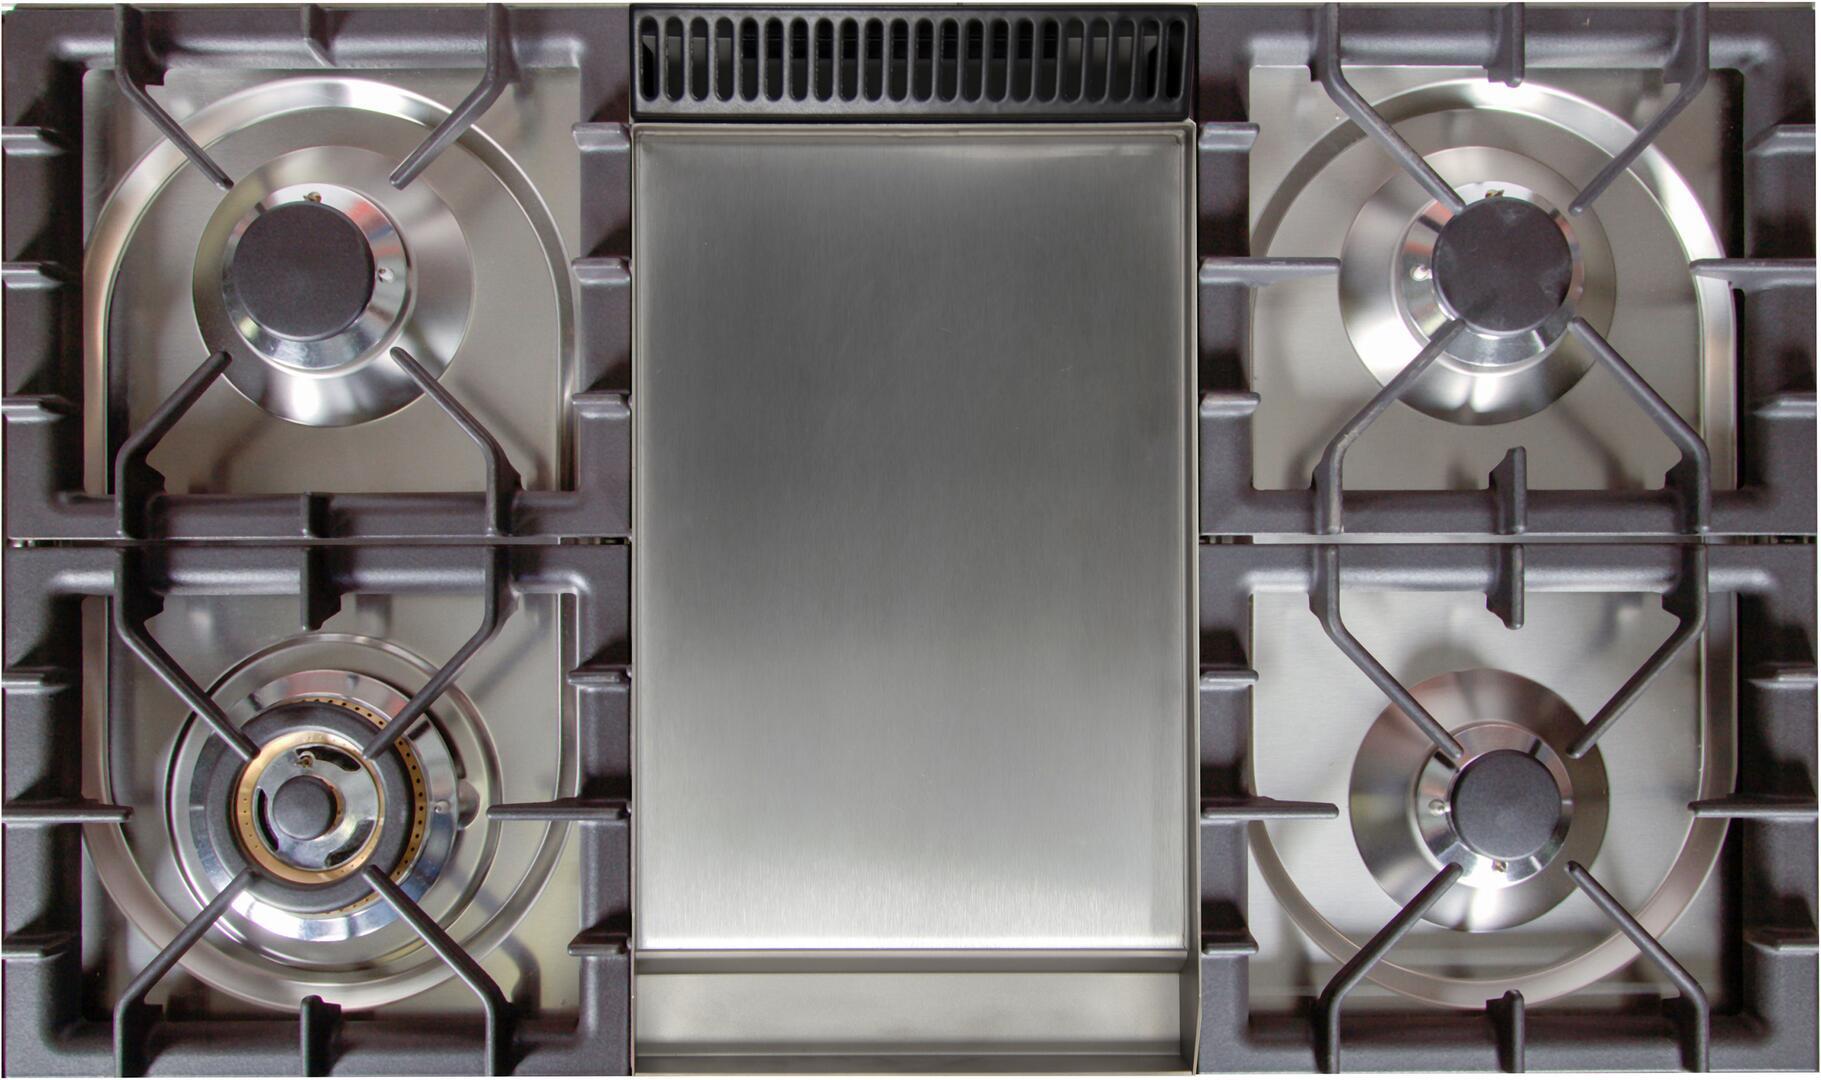 Ilve Professional Plus UPW90FDVGGB Freestanding Gas Range White, Cooktop